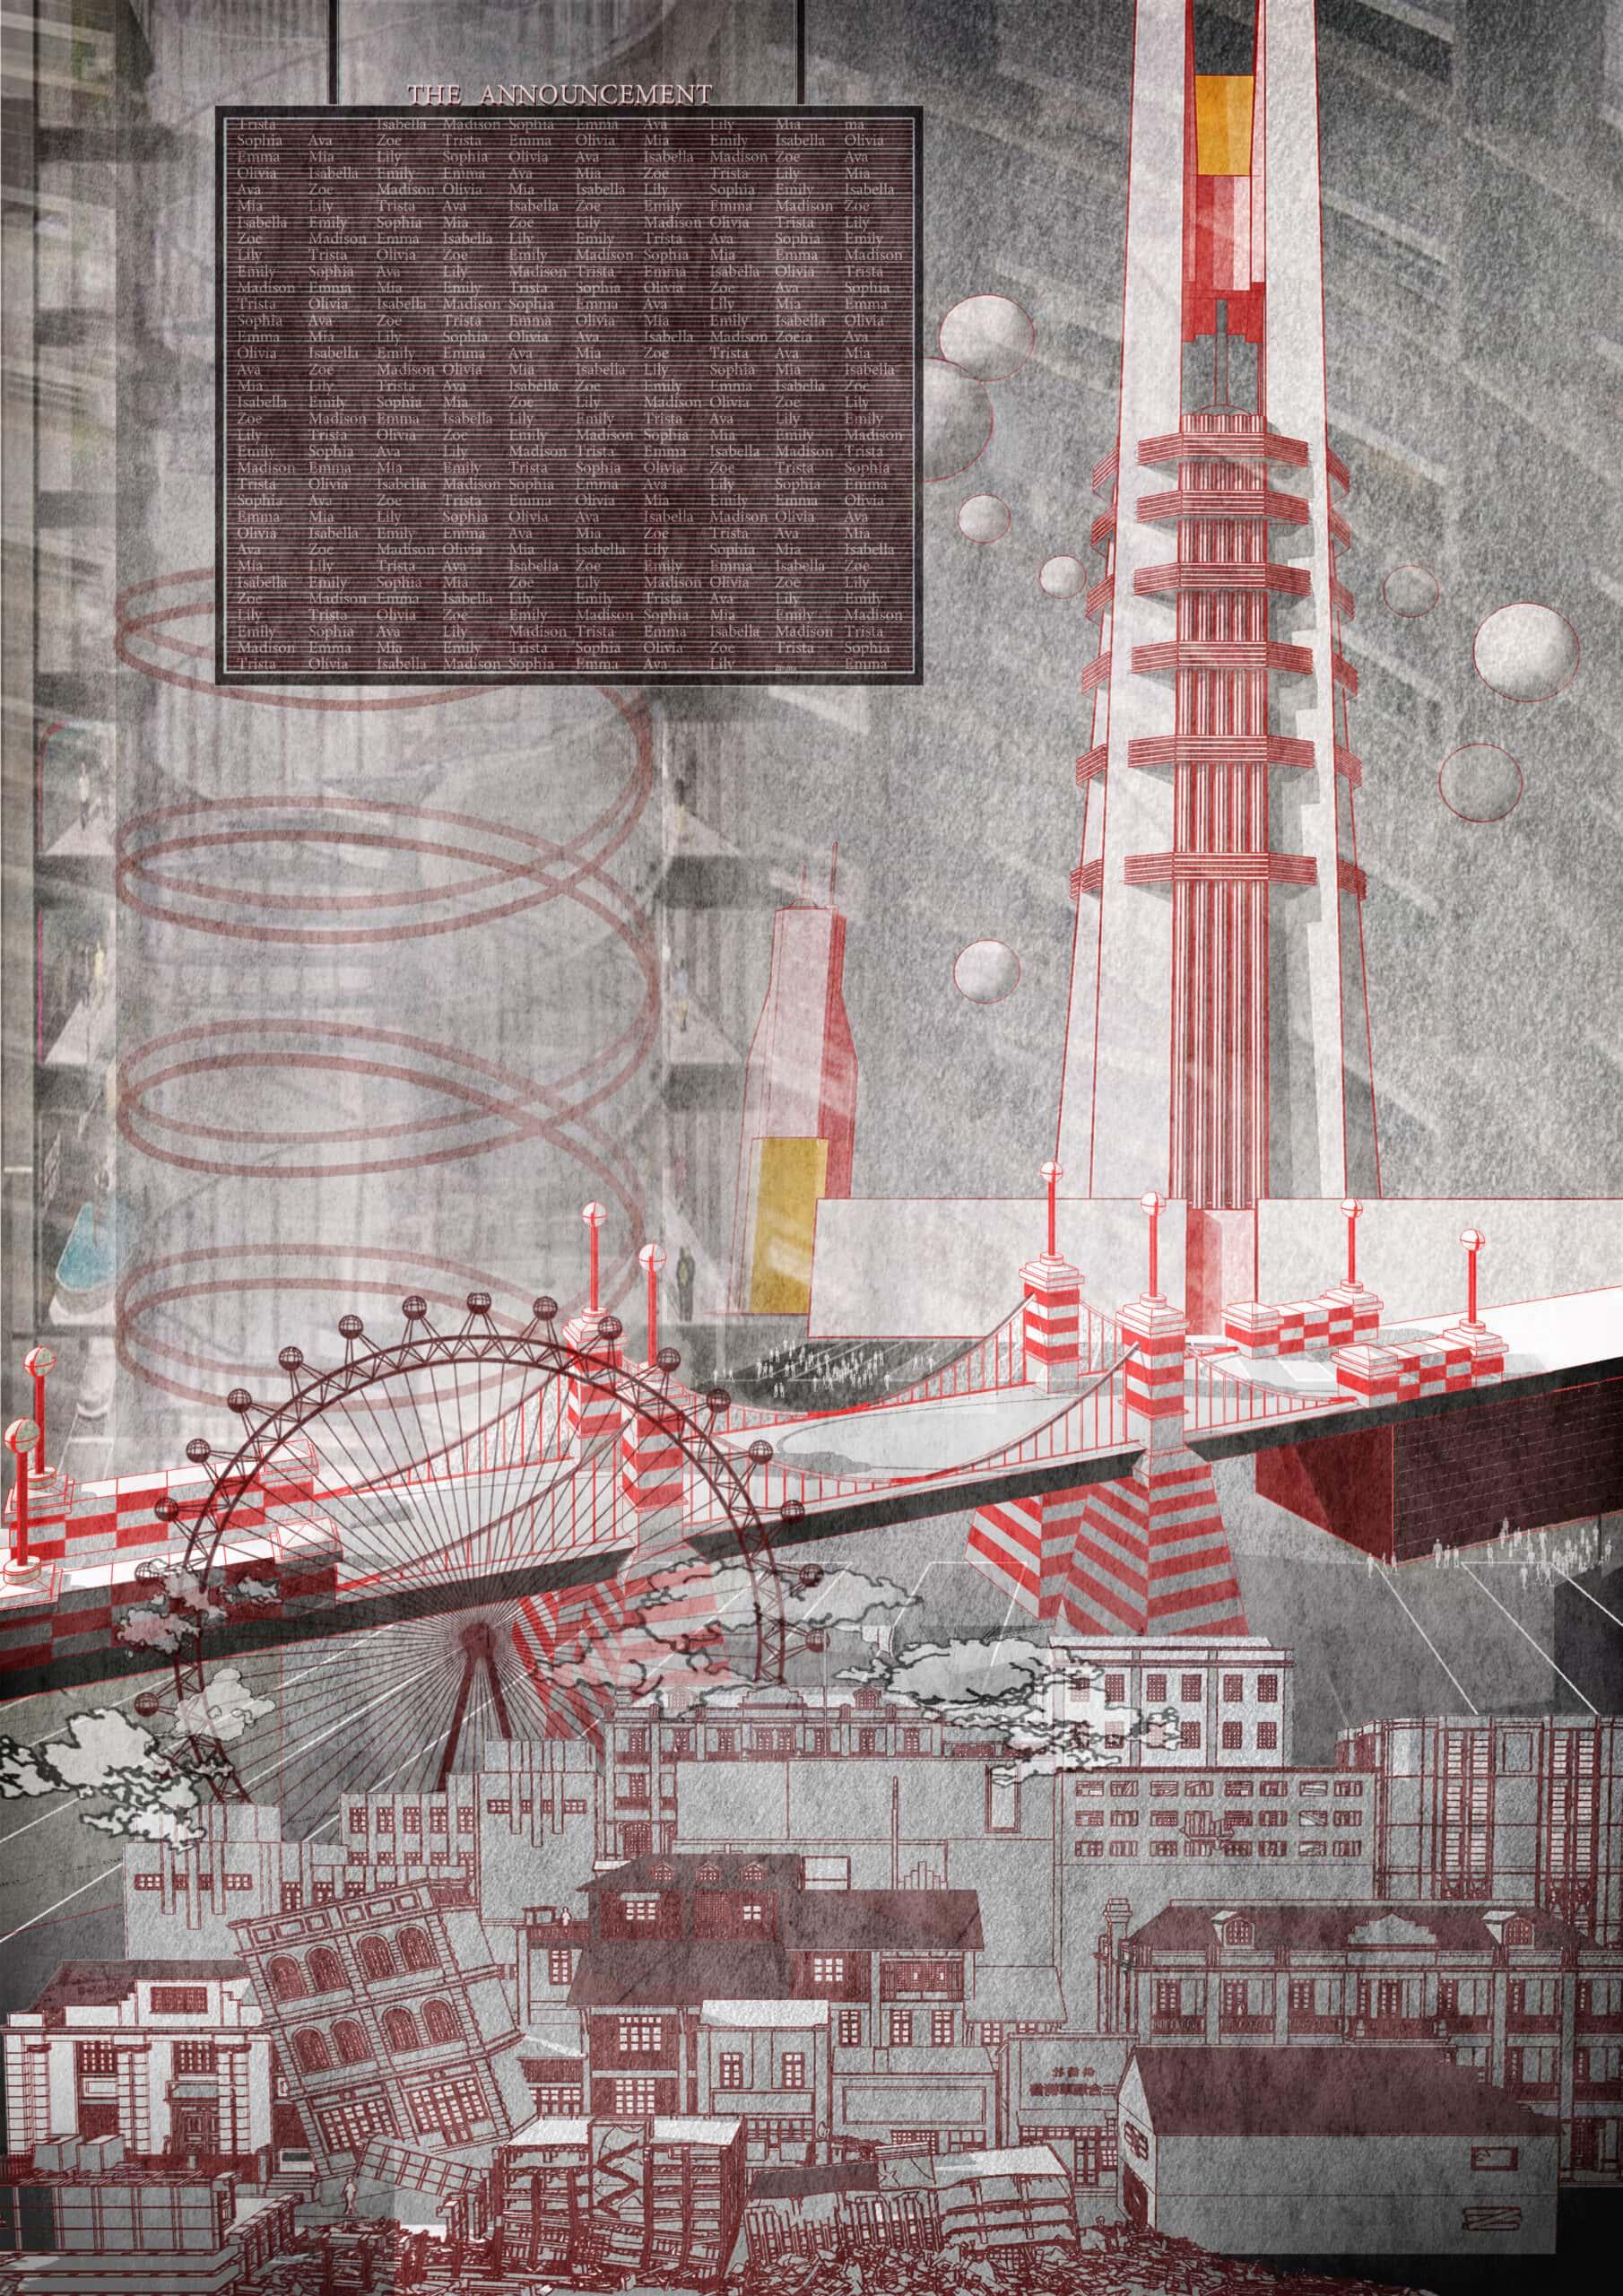 18742_Miniature city_Functional